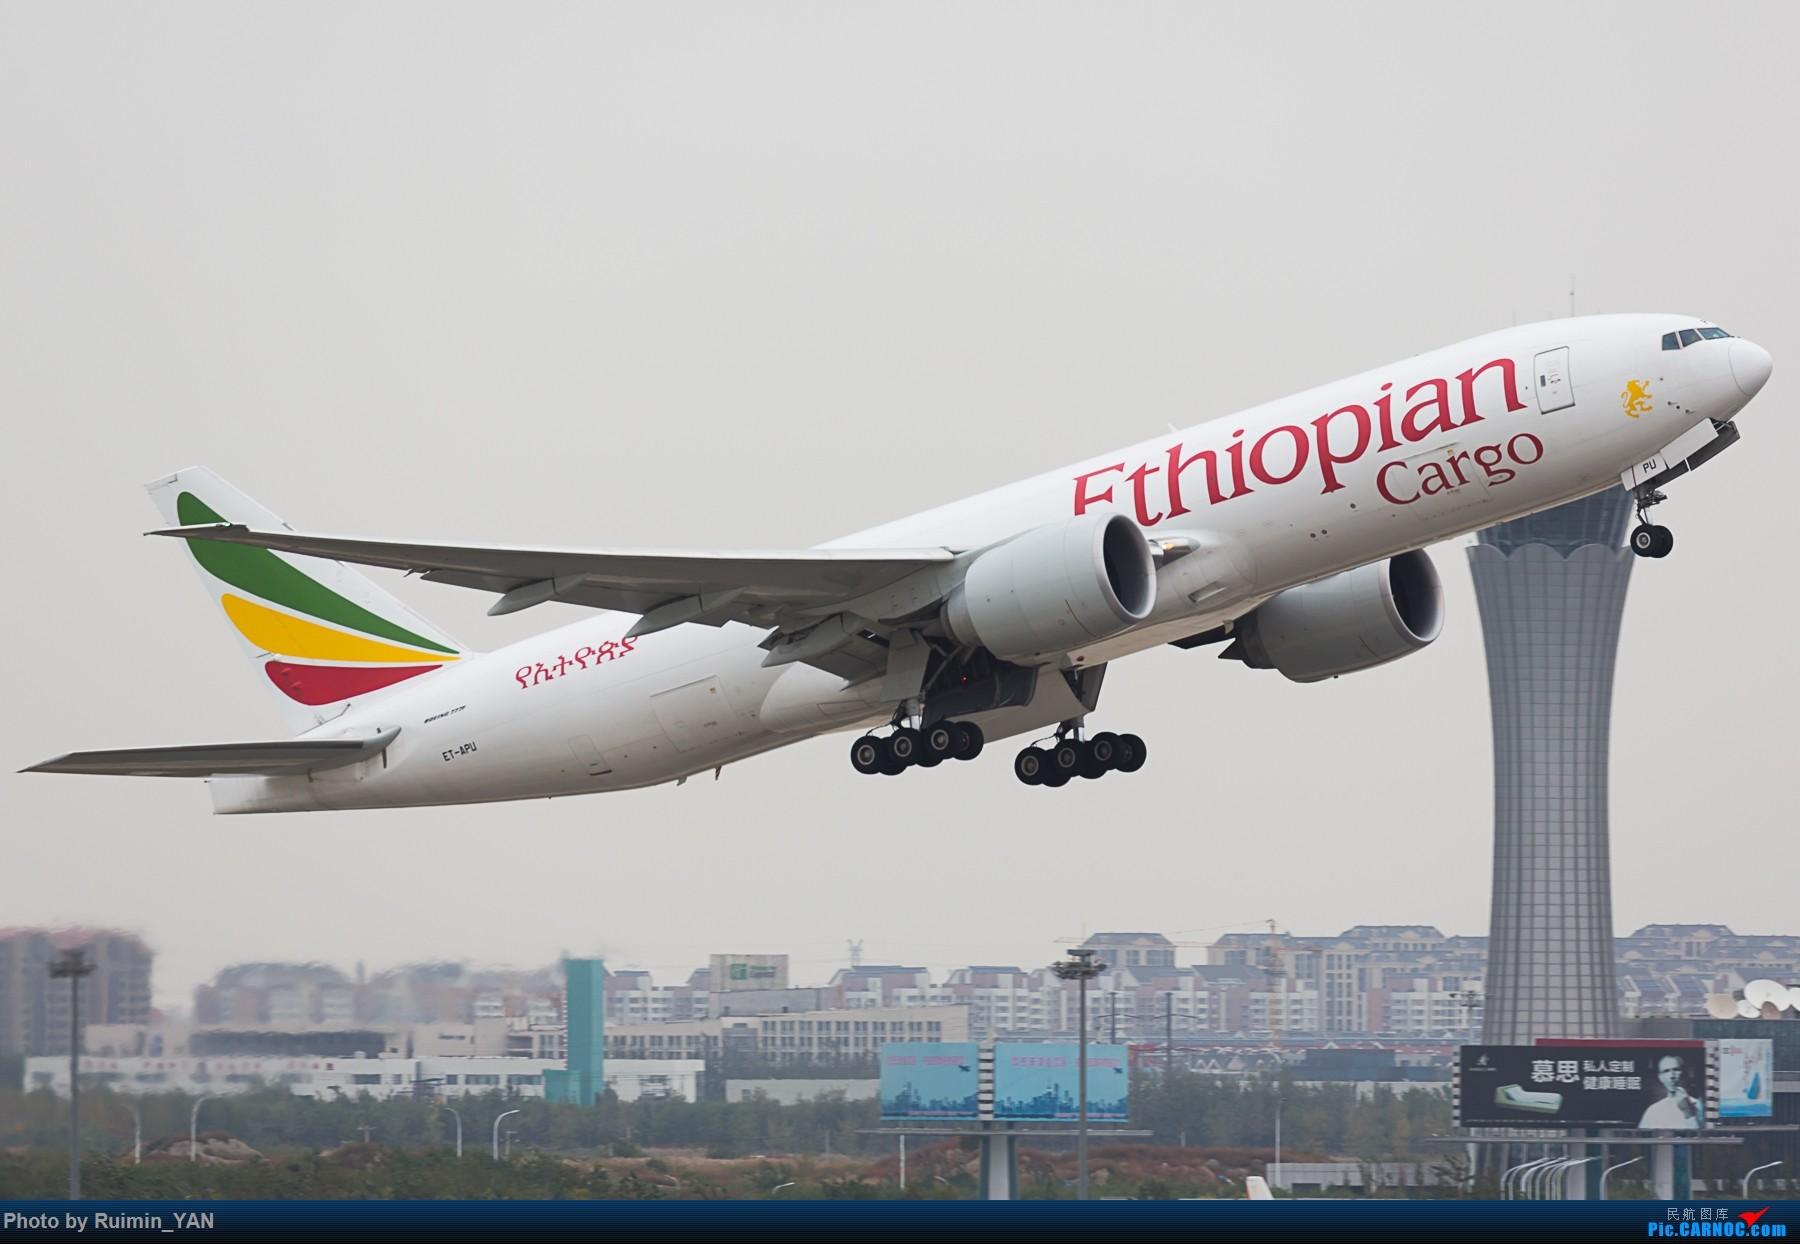 Re:[原创]【TSN】【卡狗】埃塞尔比亚航空(ET, Ethiopian Airlines) ET-APU 77F BOEING 777-200 ET-APU 中国天津滨海国际机场